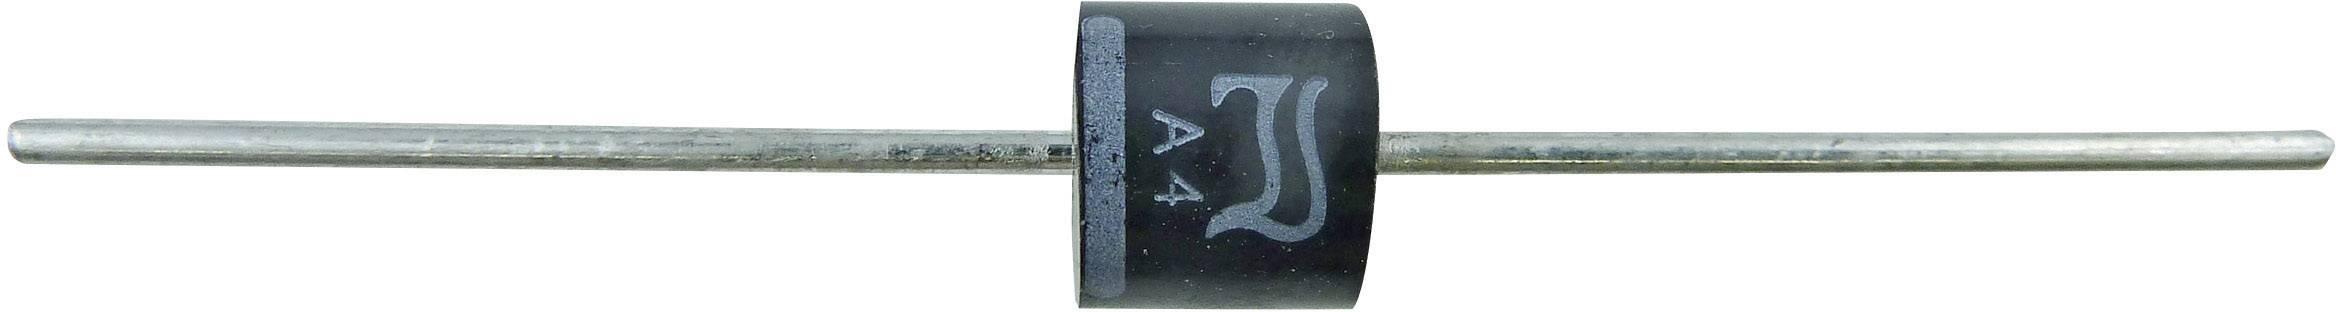 Dioda Diotec P1000S, I(F) 10 A, U(R) 1200 V